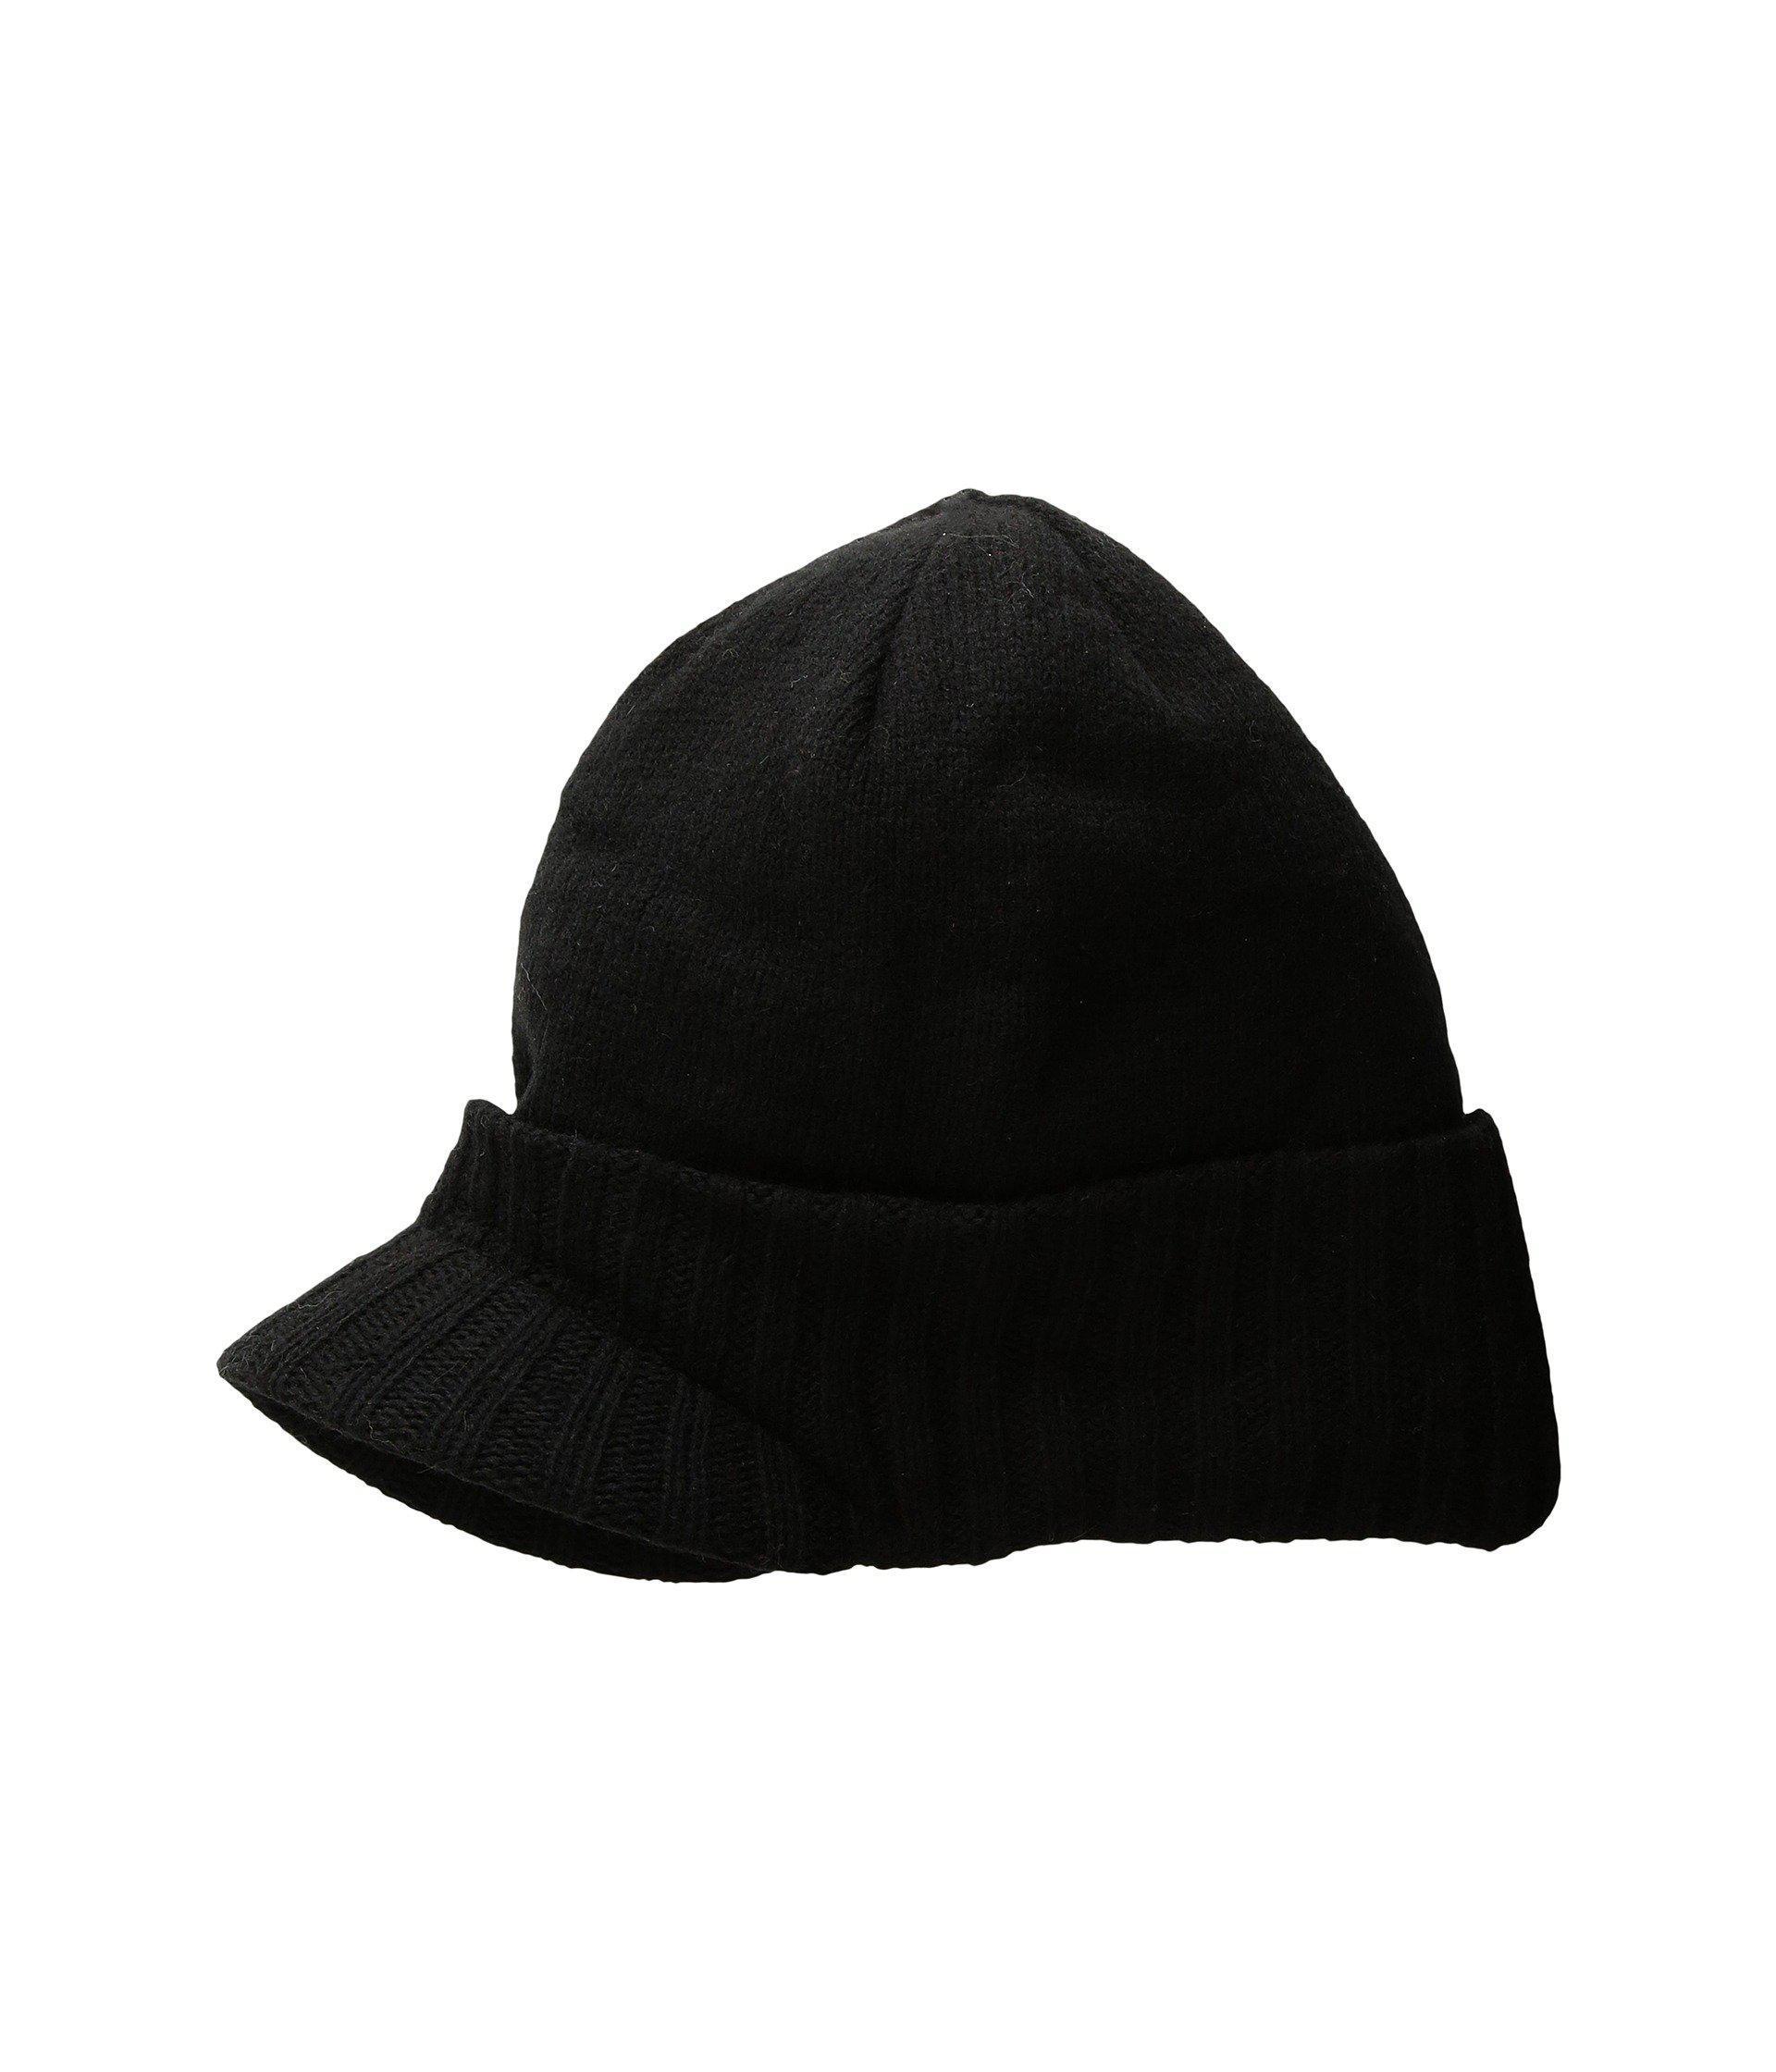 26854ef0516 Lyst - Coal The Rowan Brim in Black for Men